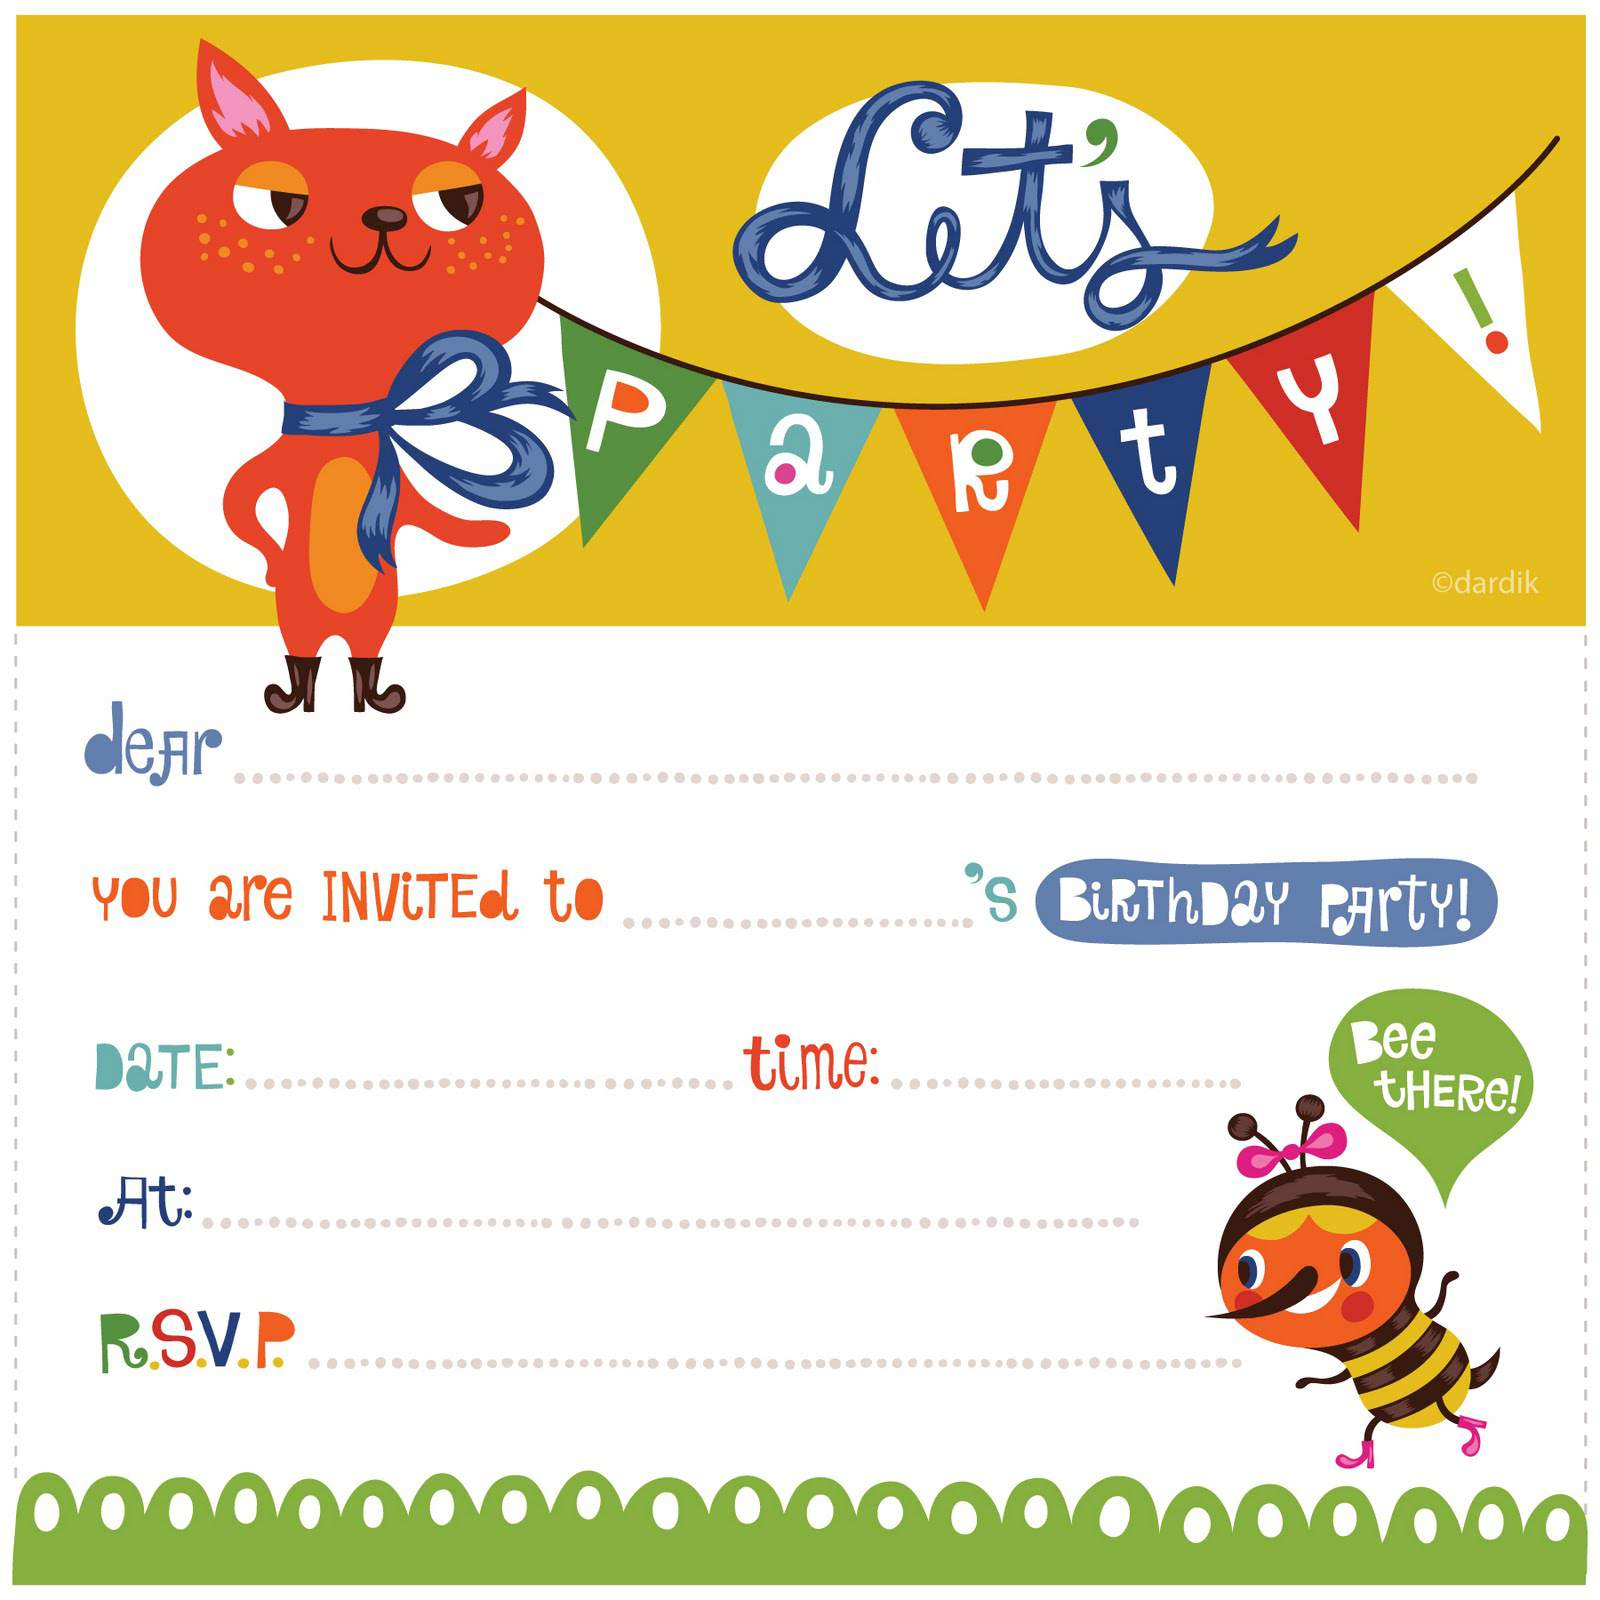 17 Free, Printable Birthday Invitations - Free Printable Birthday Invitations For Kids